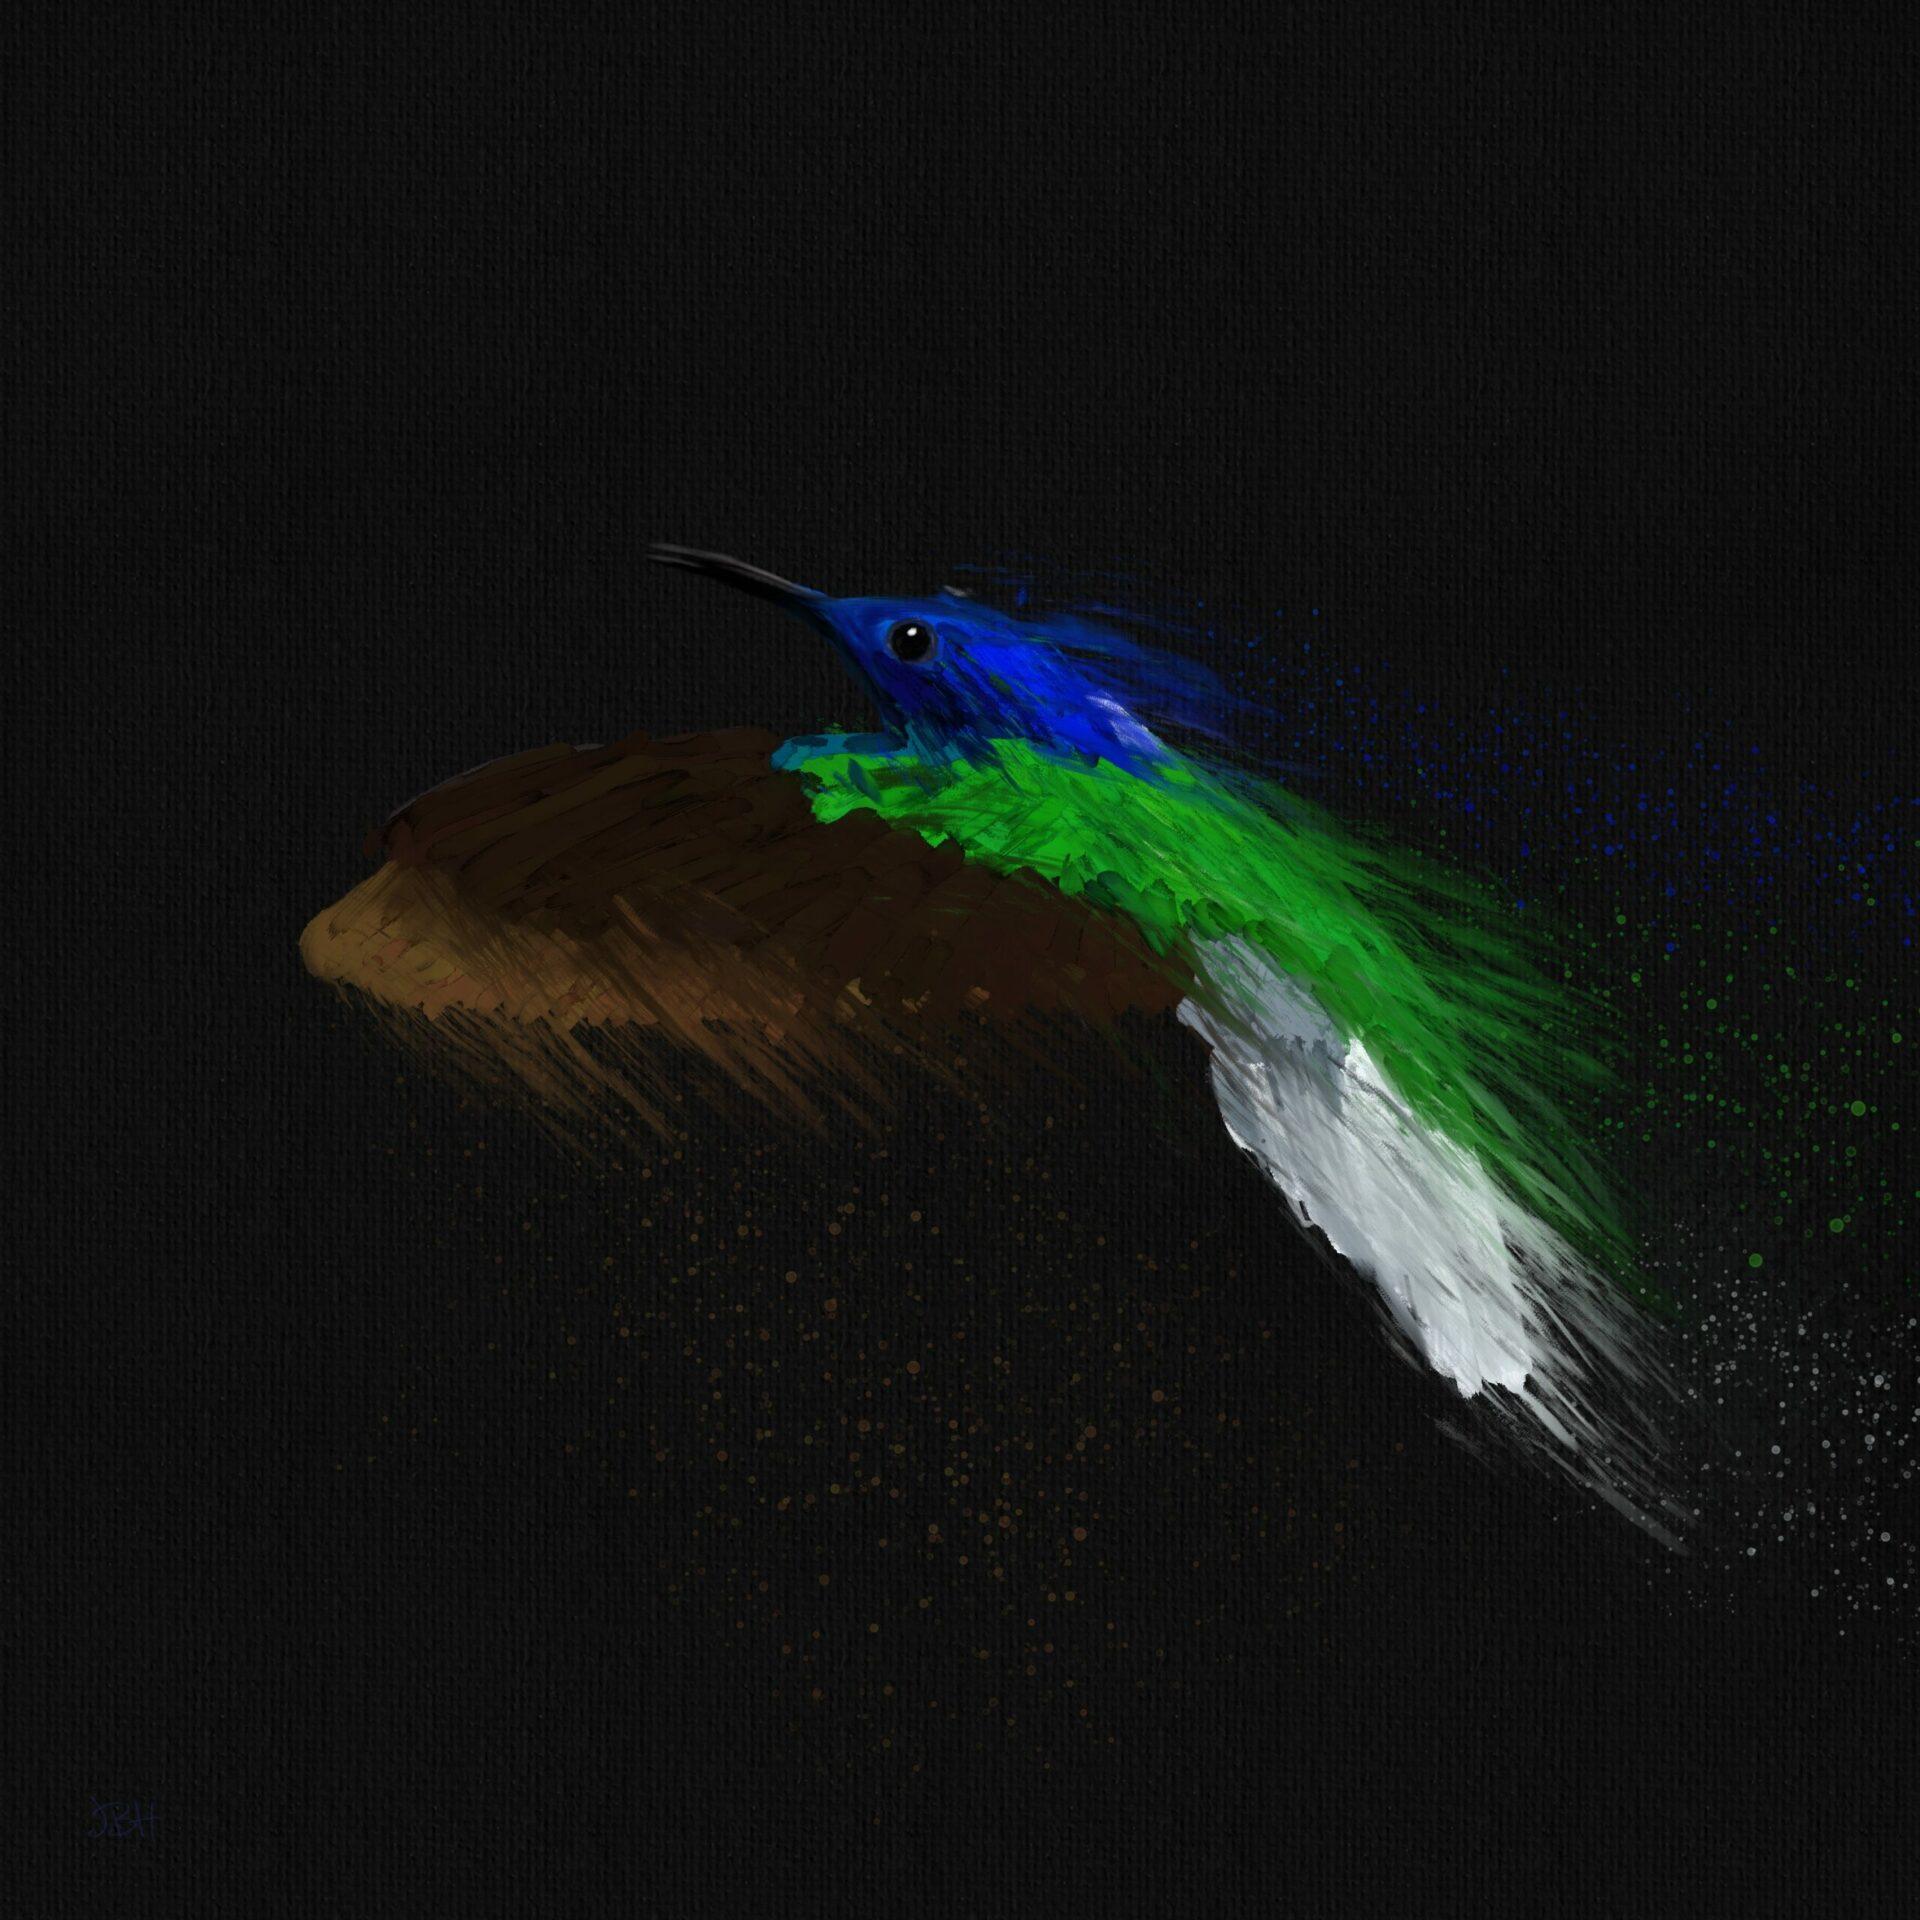 Hummingbird_aps